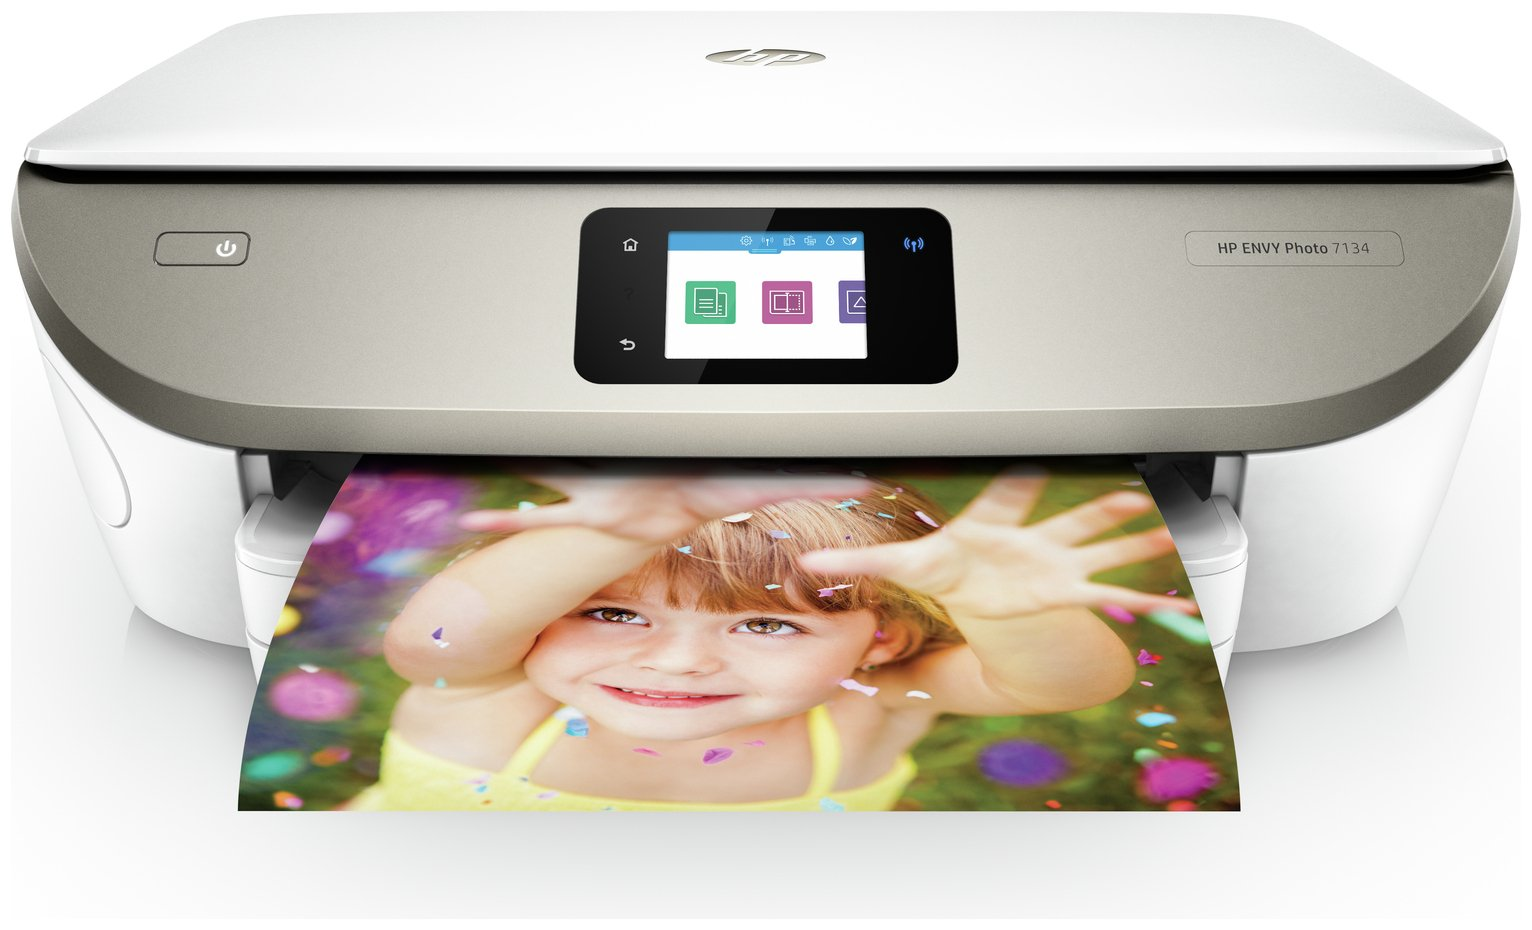 HP Envy 7134 All-in-One Inkjet Photo Printer